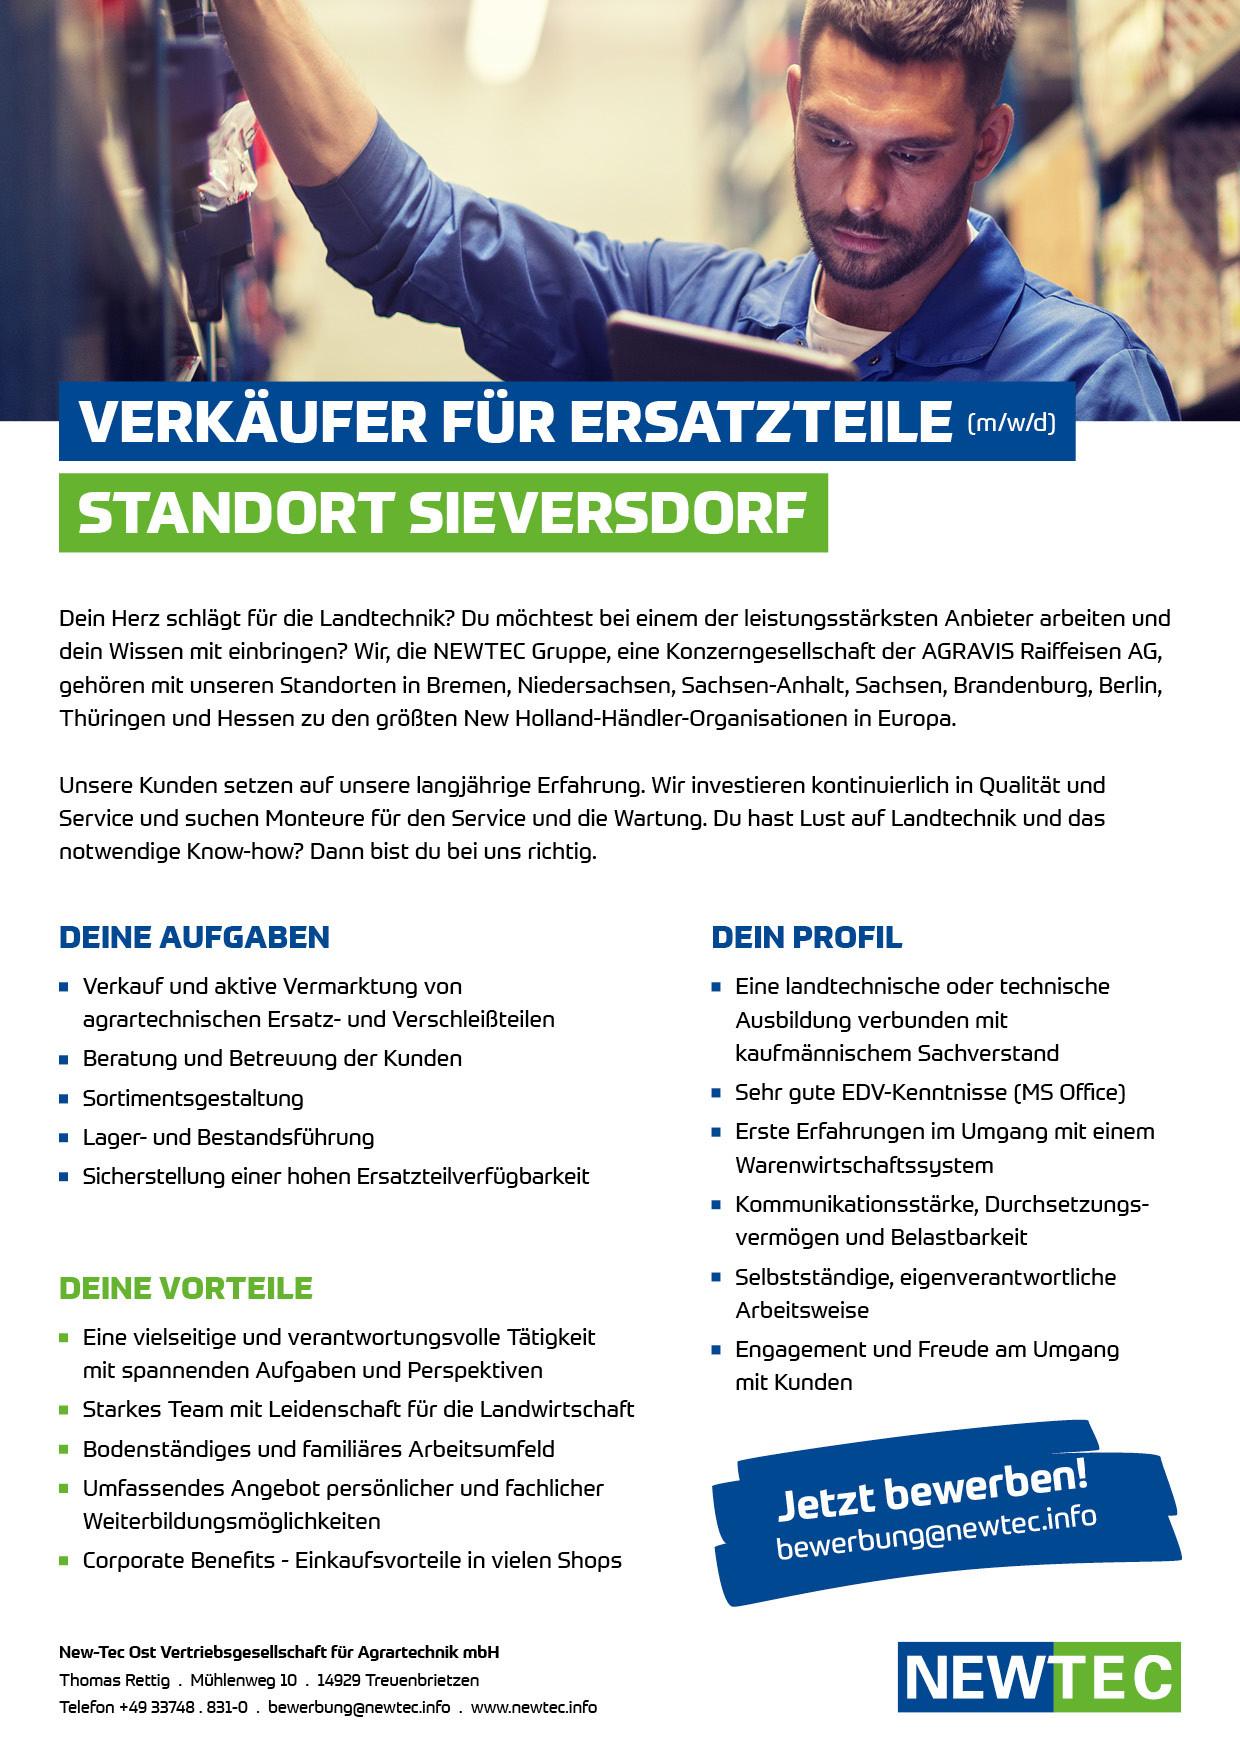 SCREEN_TE-NTOST-2021-29650_Stellenanzeige_Verkaeufer_fuer_Ersatzteile_Sieversdorf